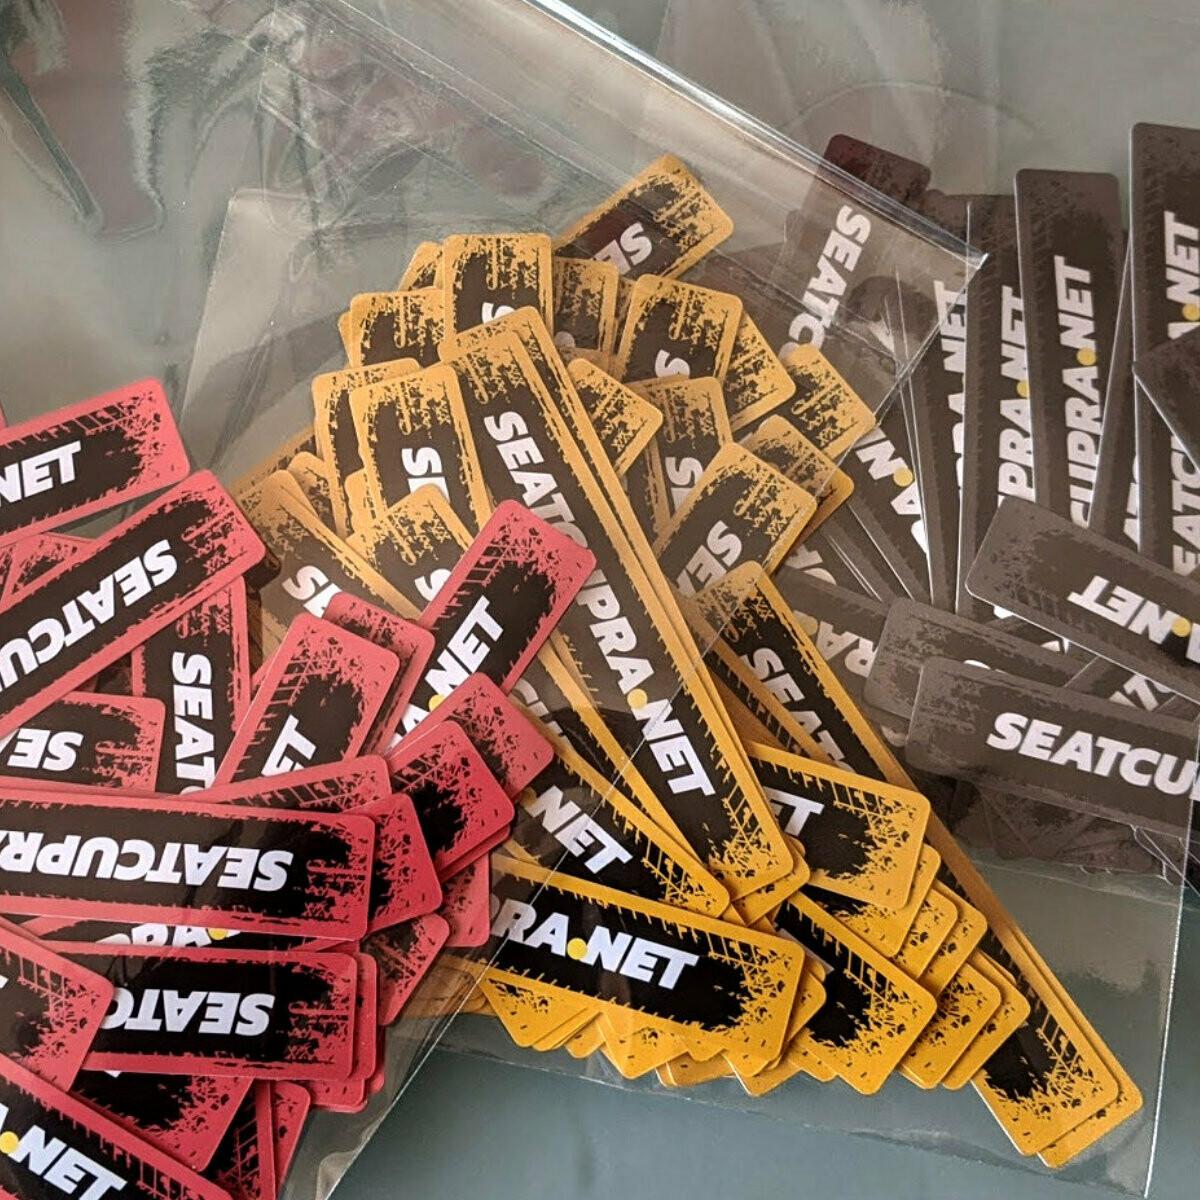 SEATCUPRA.NET x3 Multipurpose Waterproof Permanent Stickers - (new product)